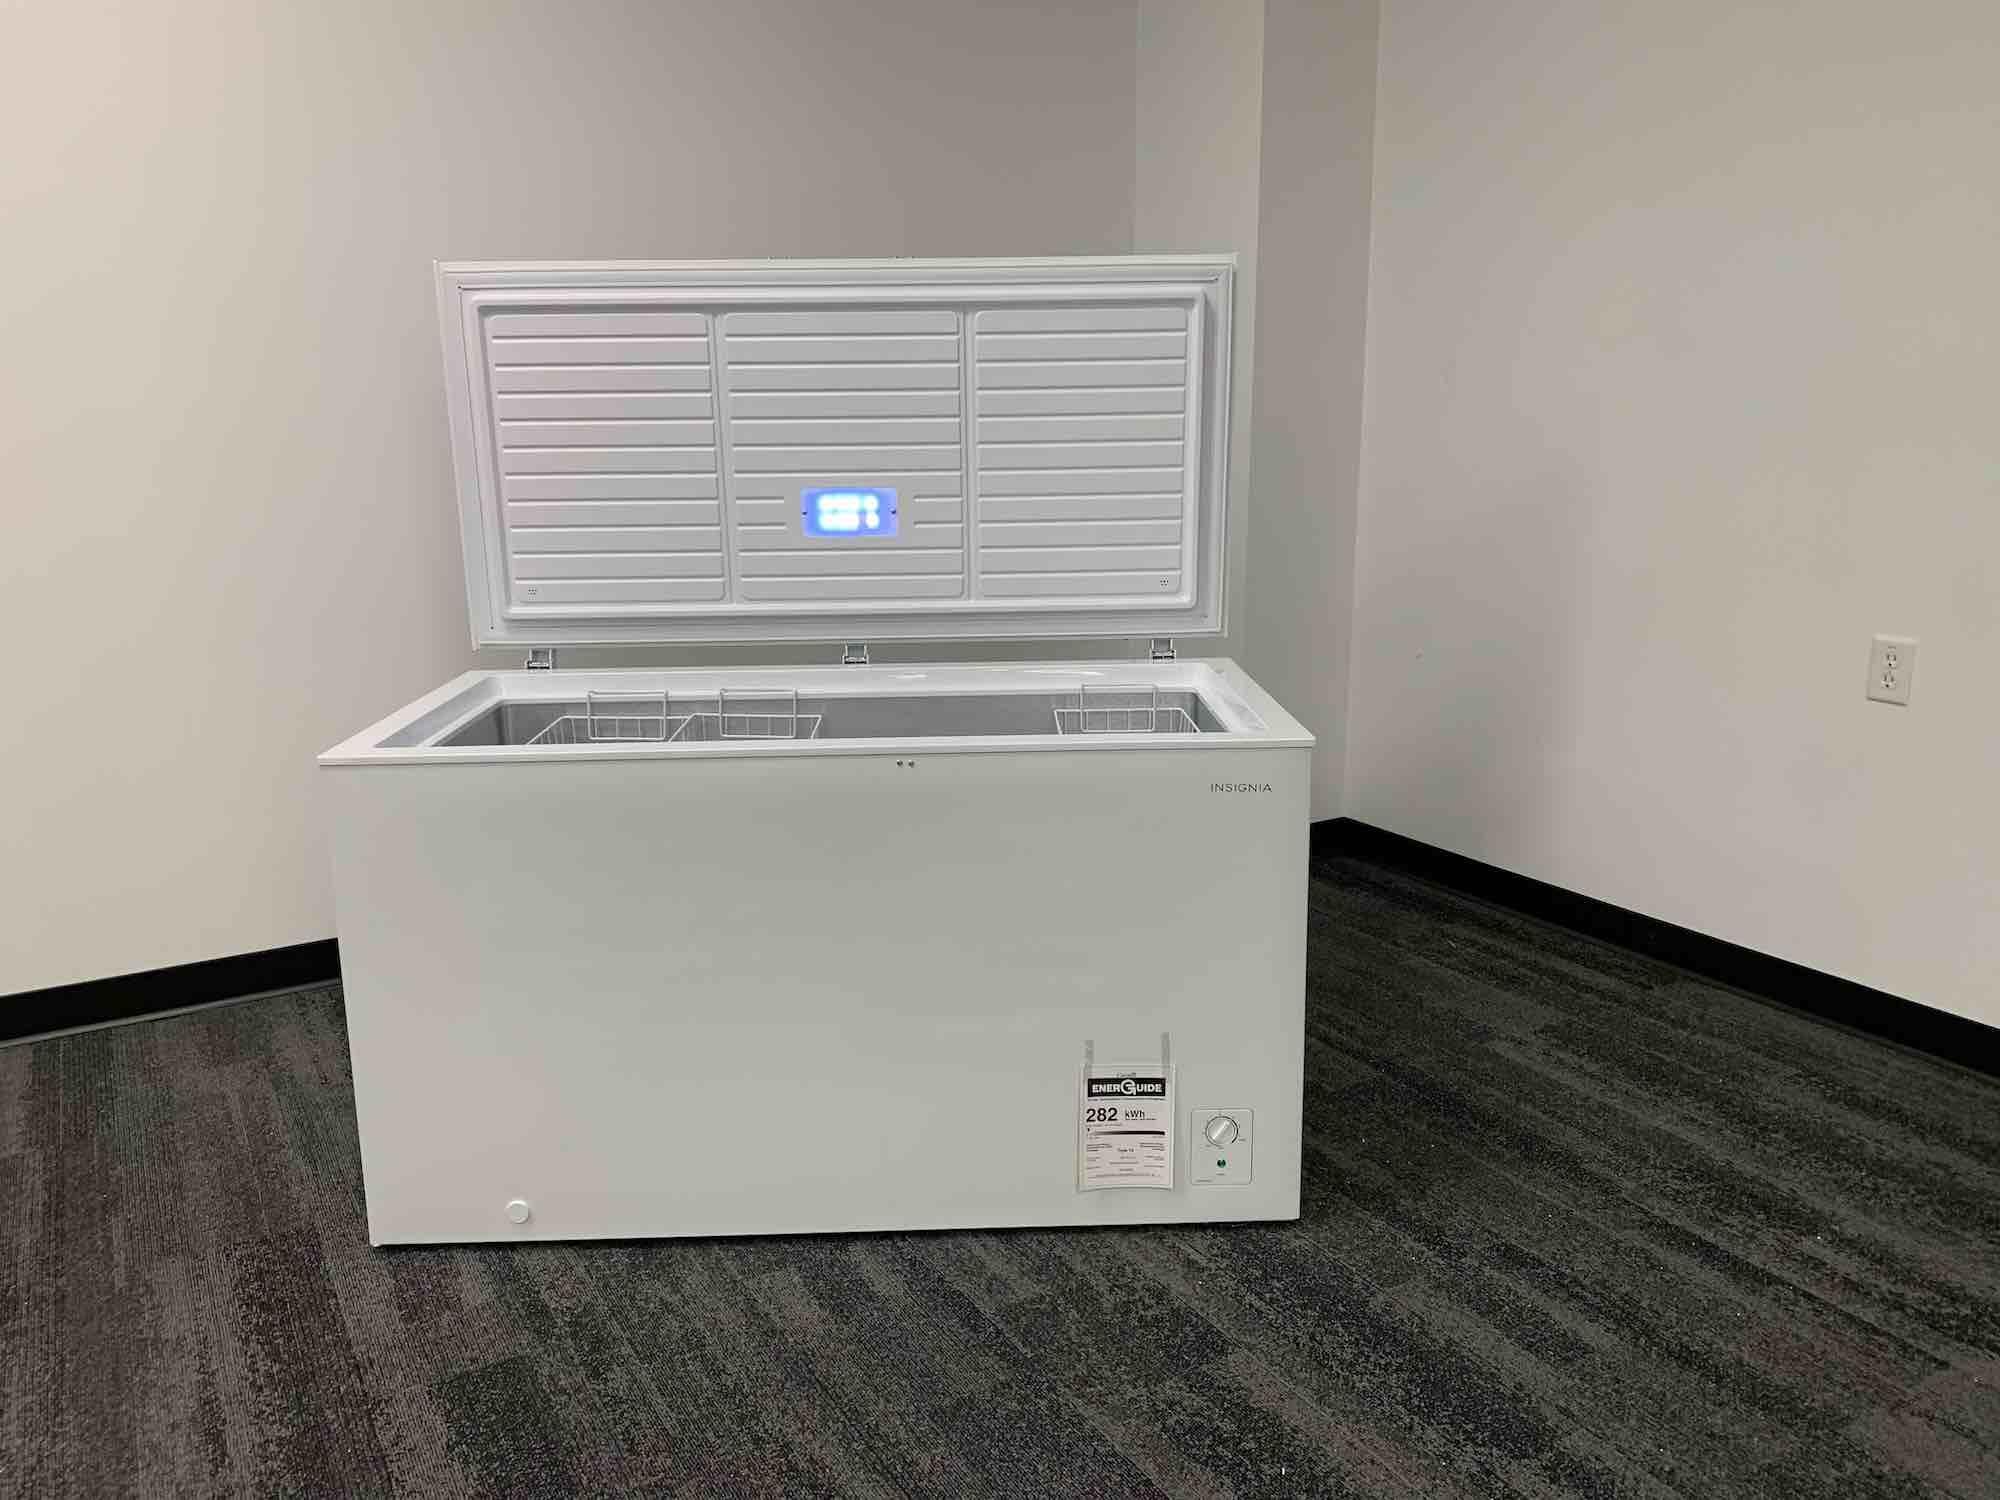 Insignia 14 cu.ft. chest freezer review